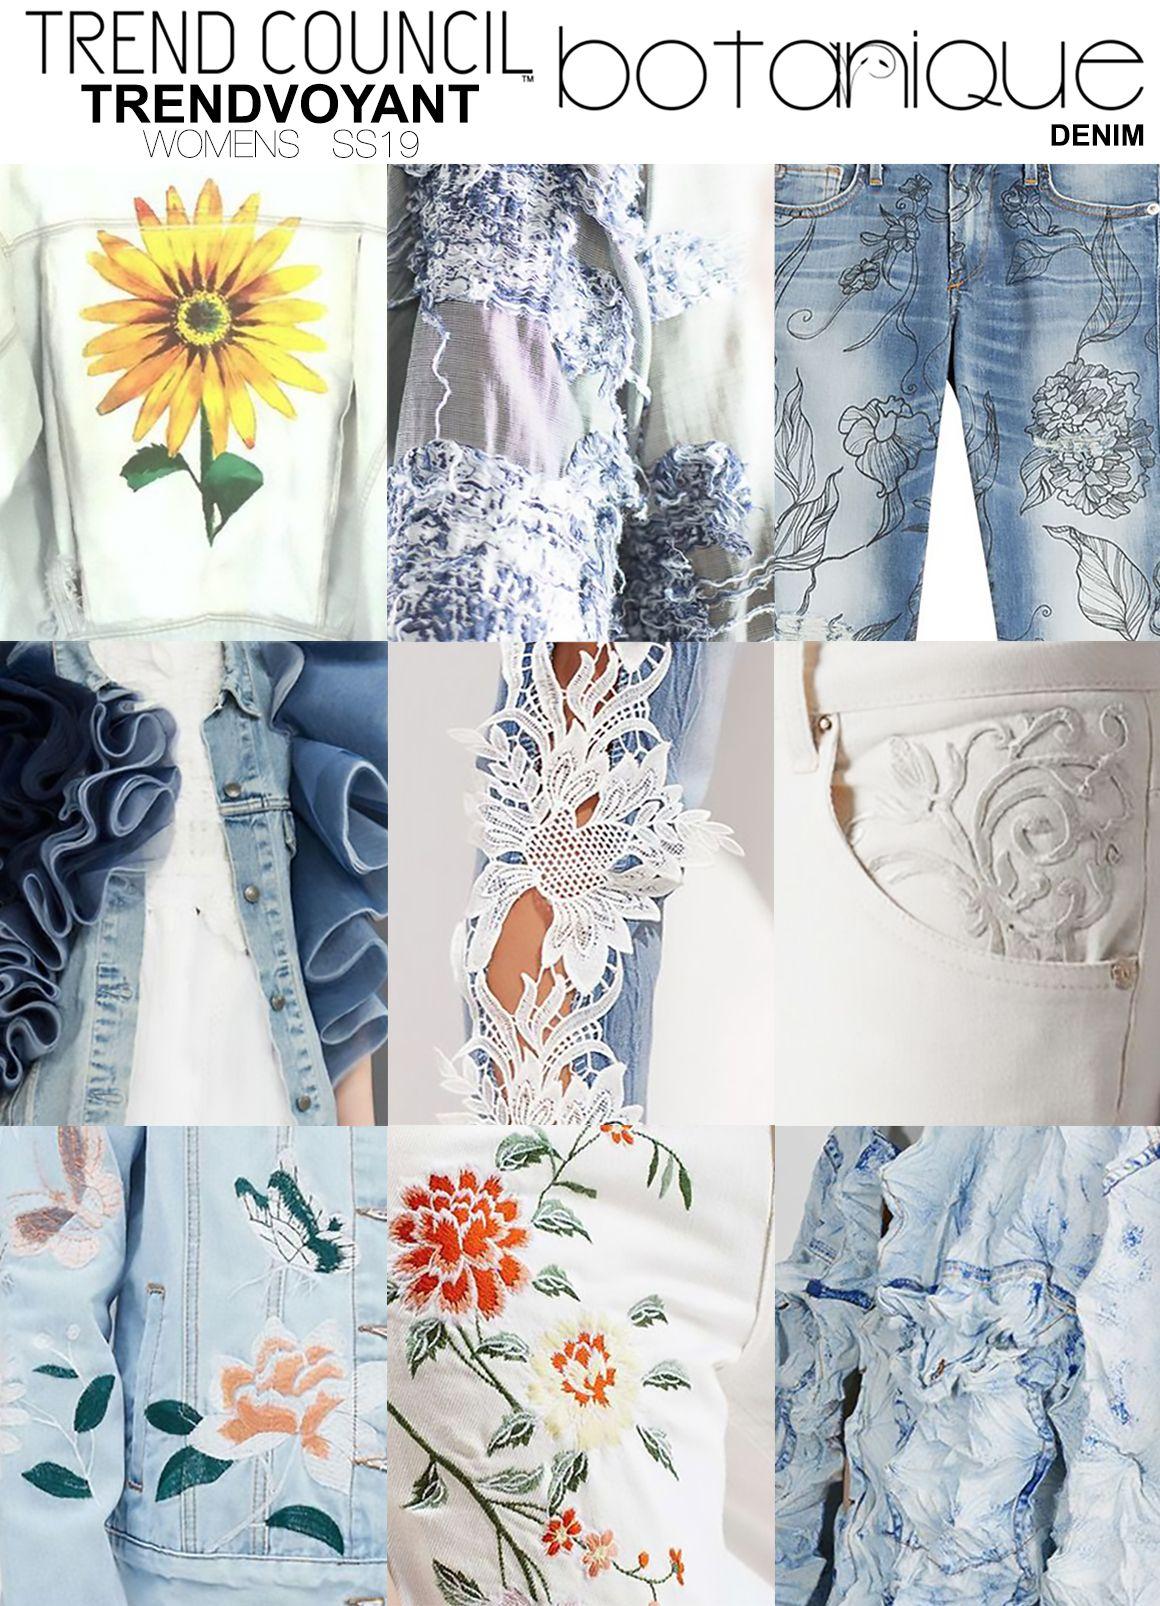 01 5 botanique denim | коллаж | Fashion trends, Fashion ...